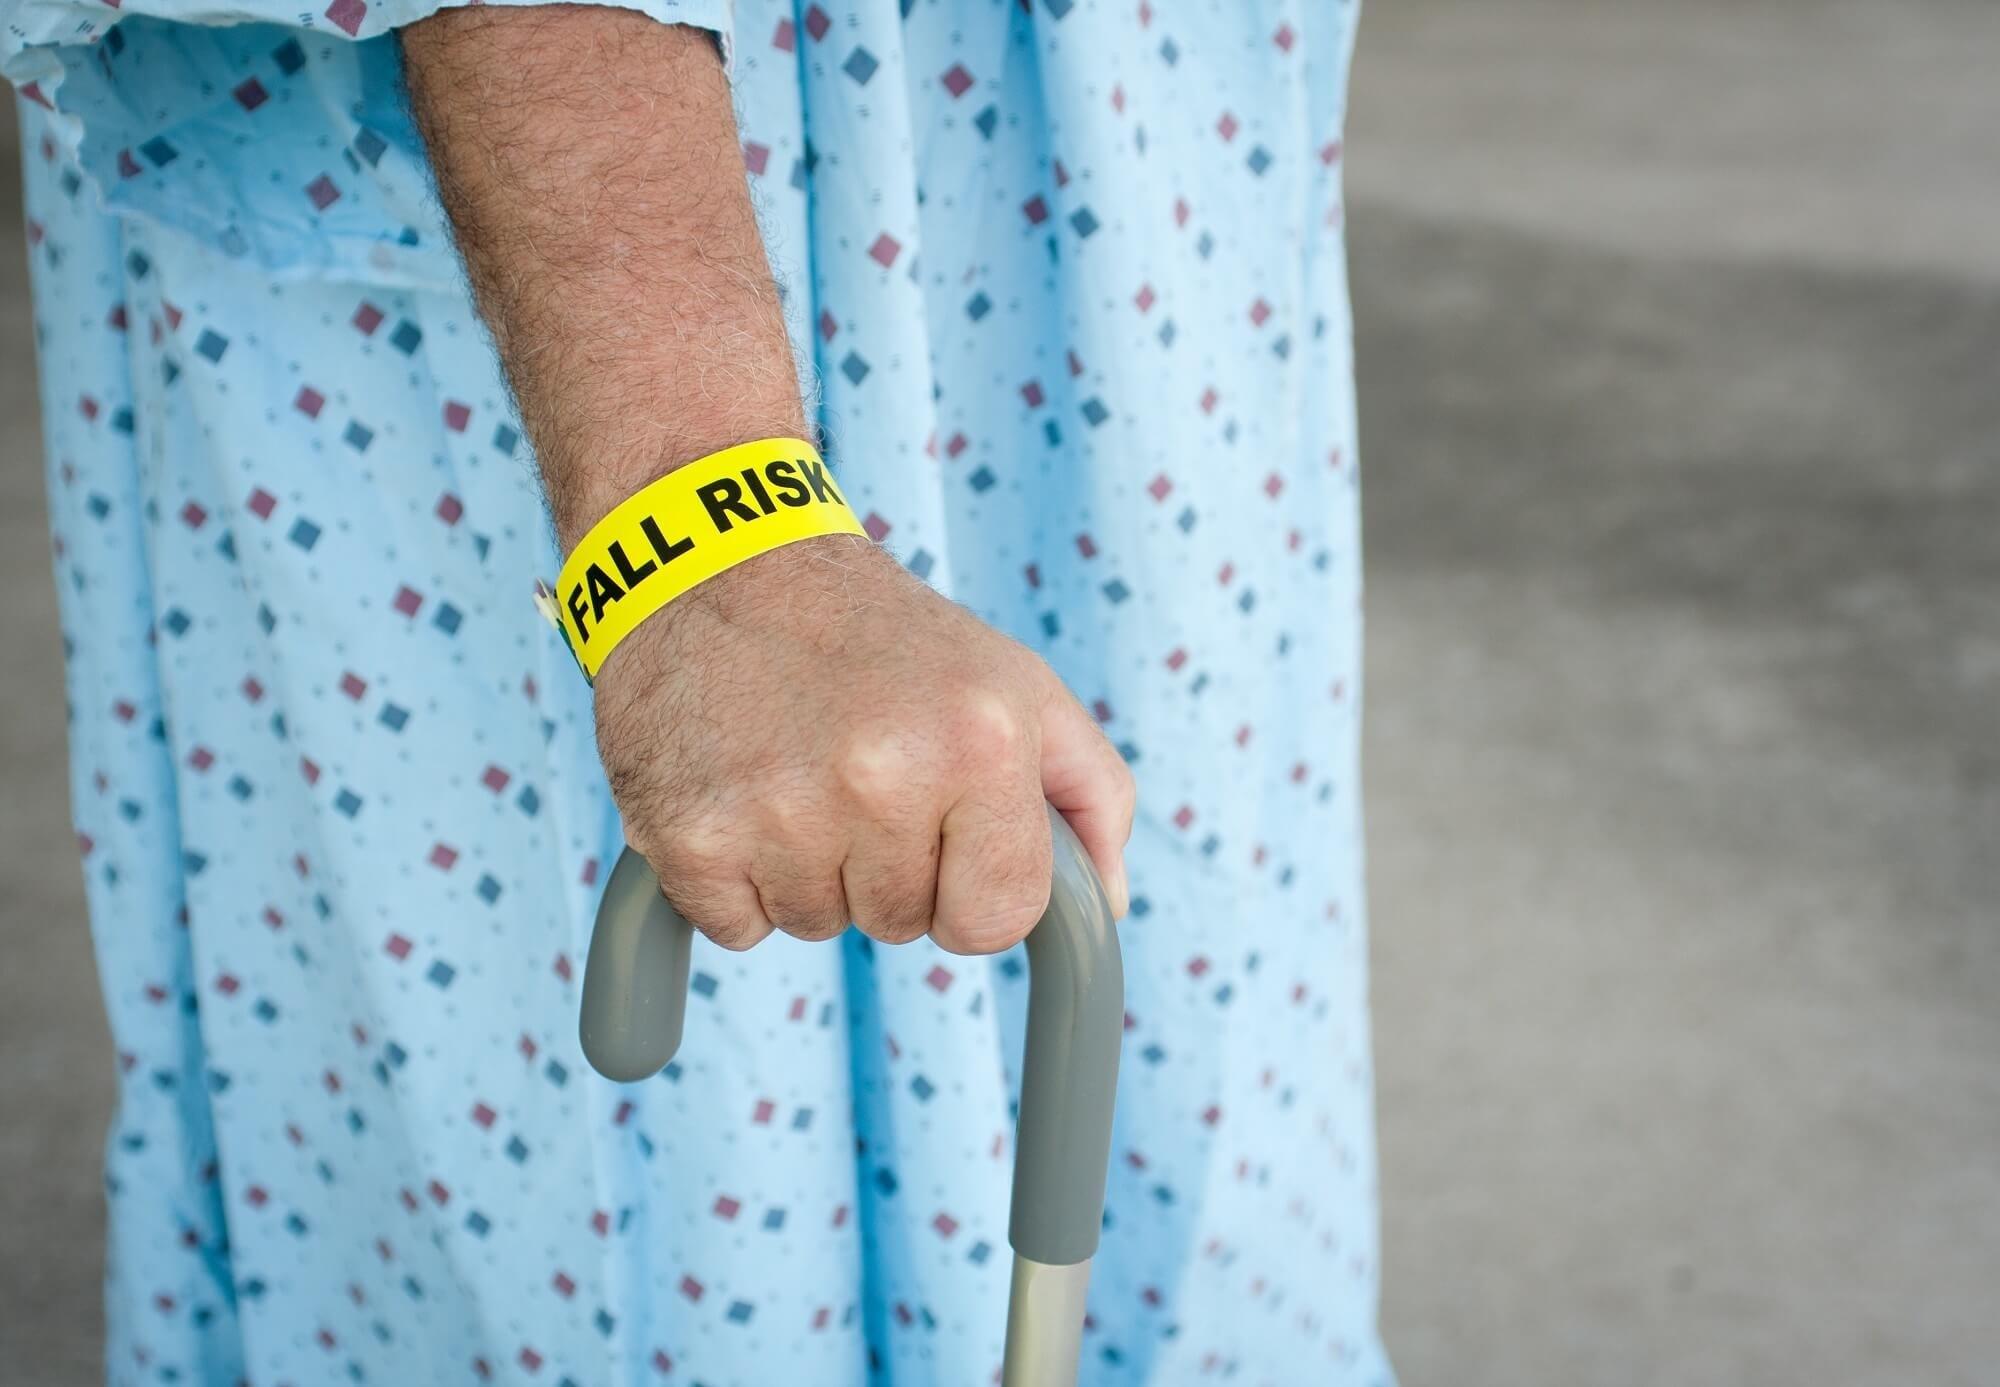 Cardiovascular Autonomic Neuropathy Raises Fall Risk in Parkinson Disease